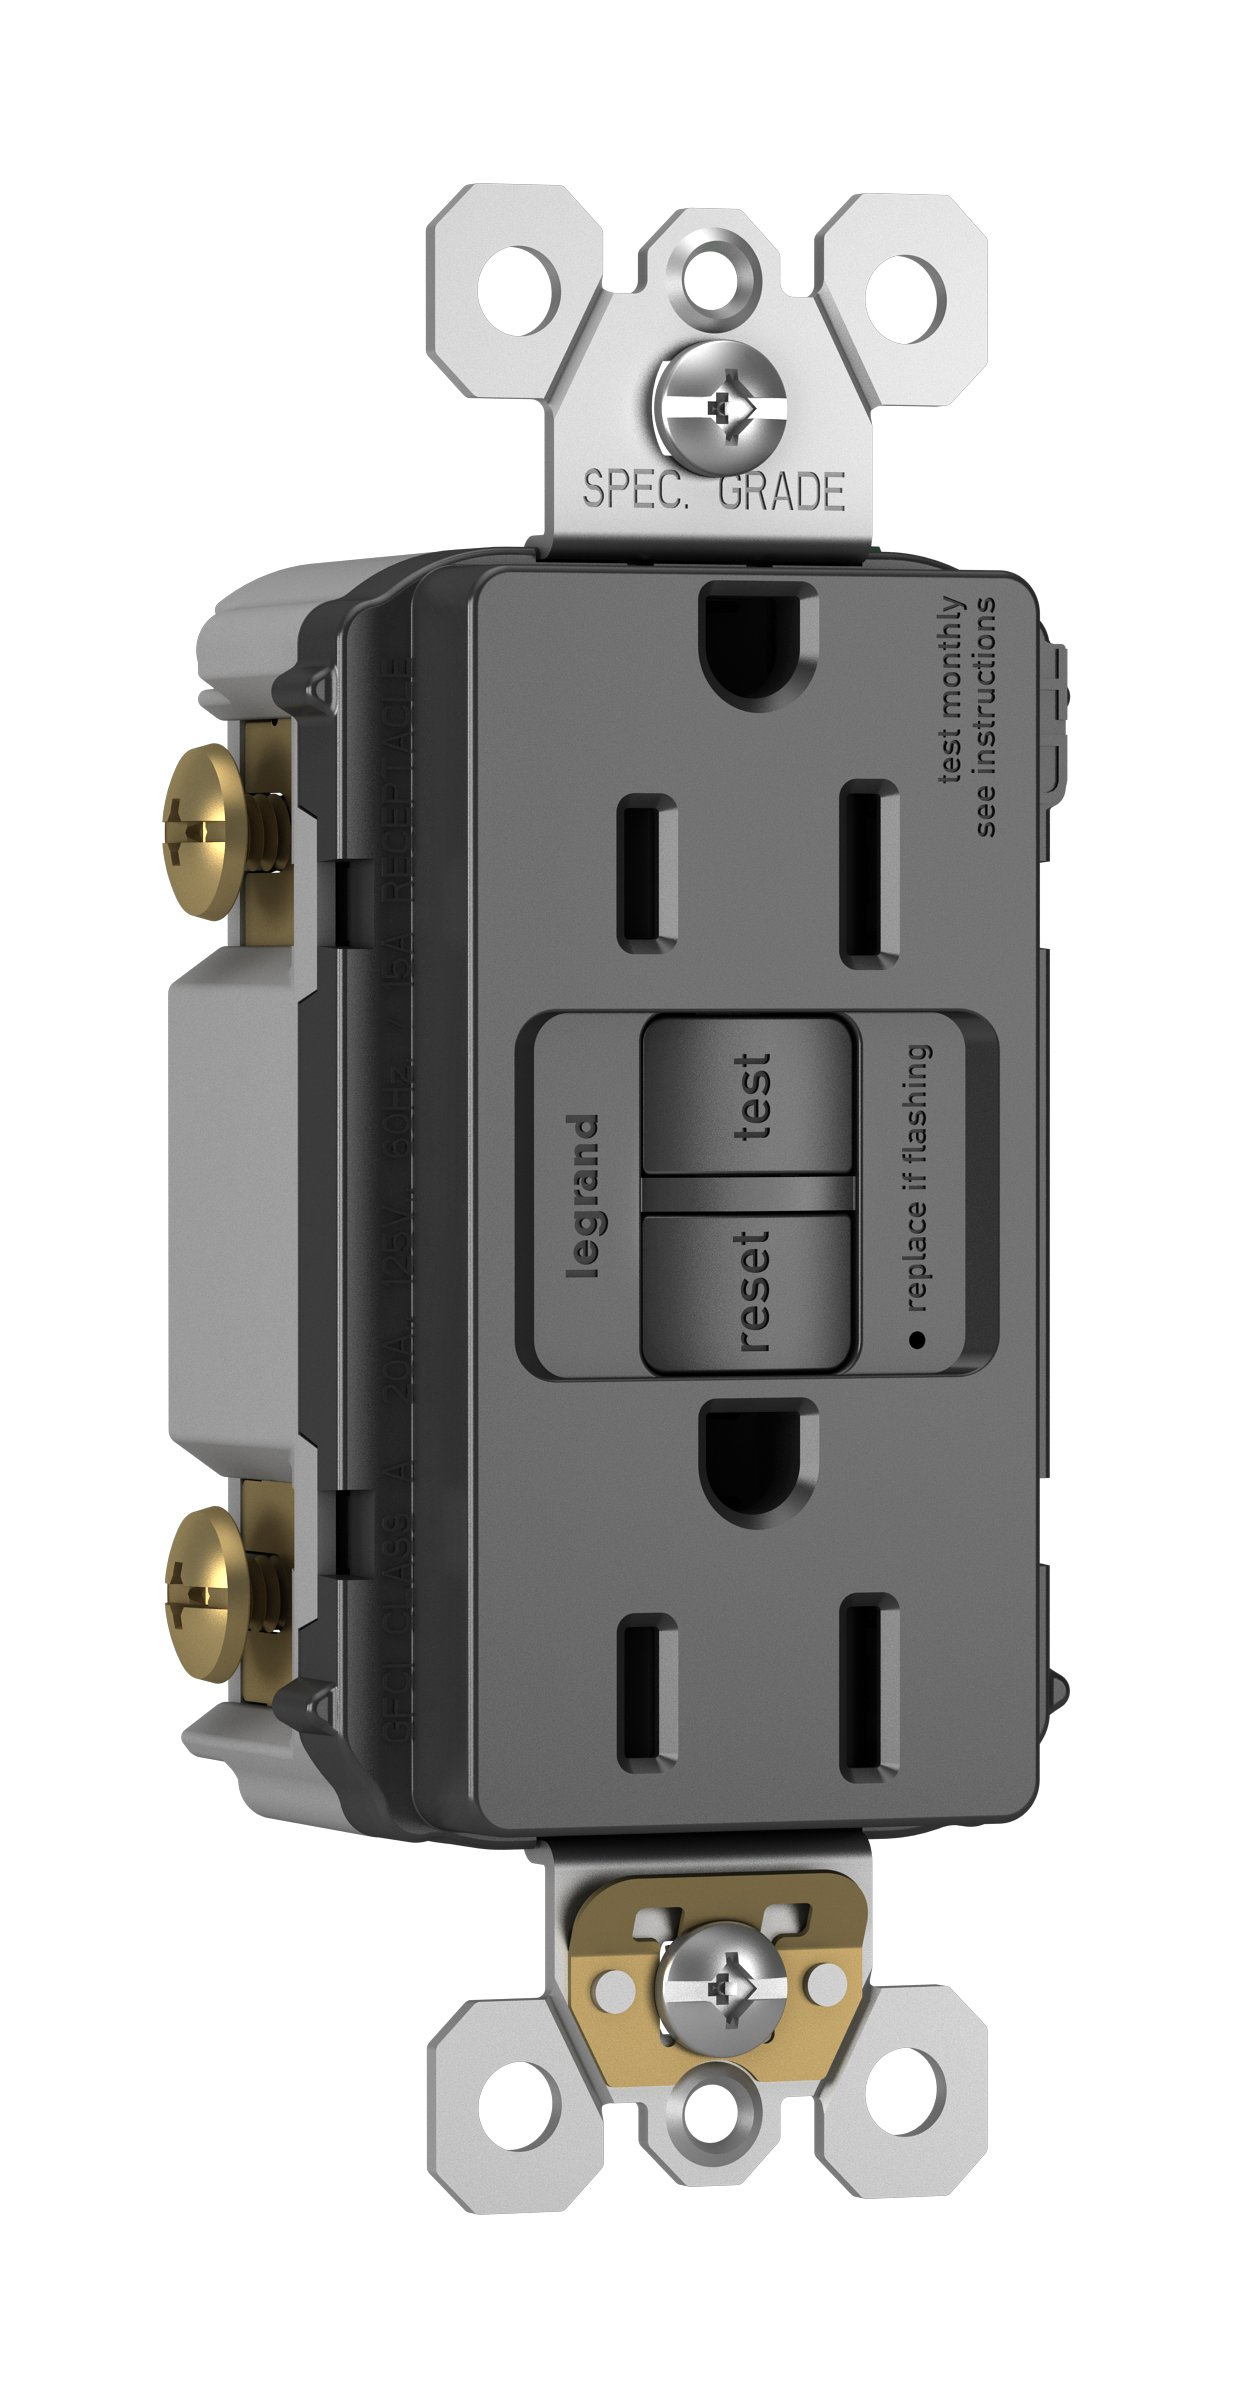 Legrand - Pass & Seymour radiant 1597TRGCC4 Tamper-Resistant 15 Amp Self-Test GFCI Outlet, Graphite